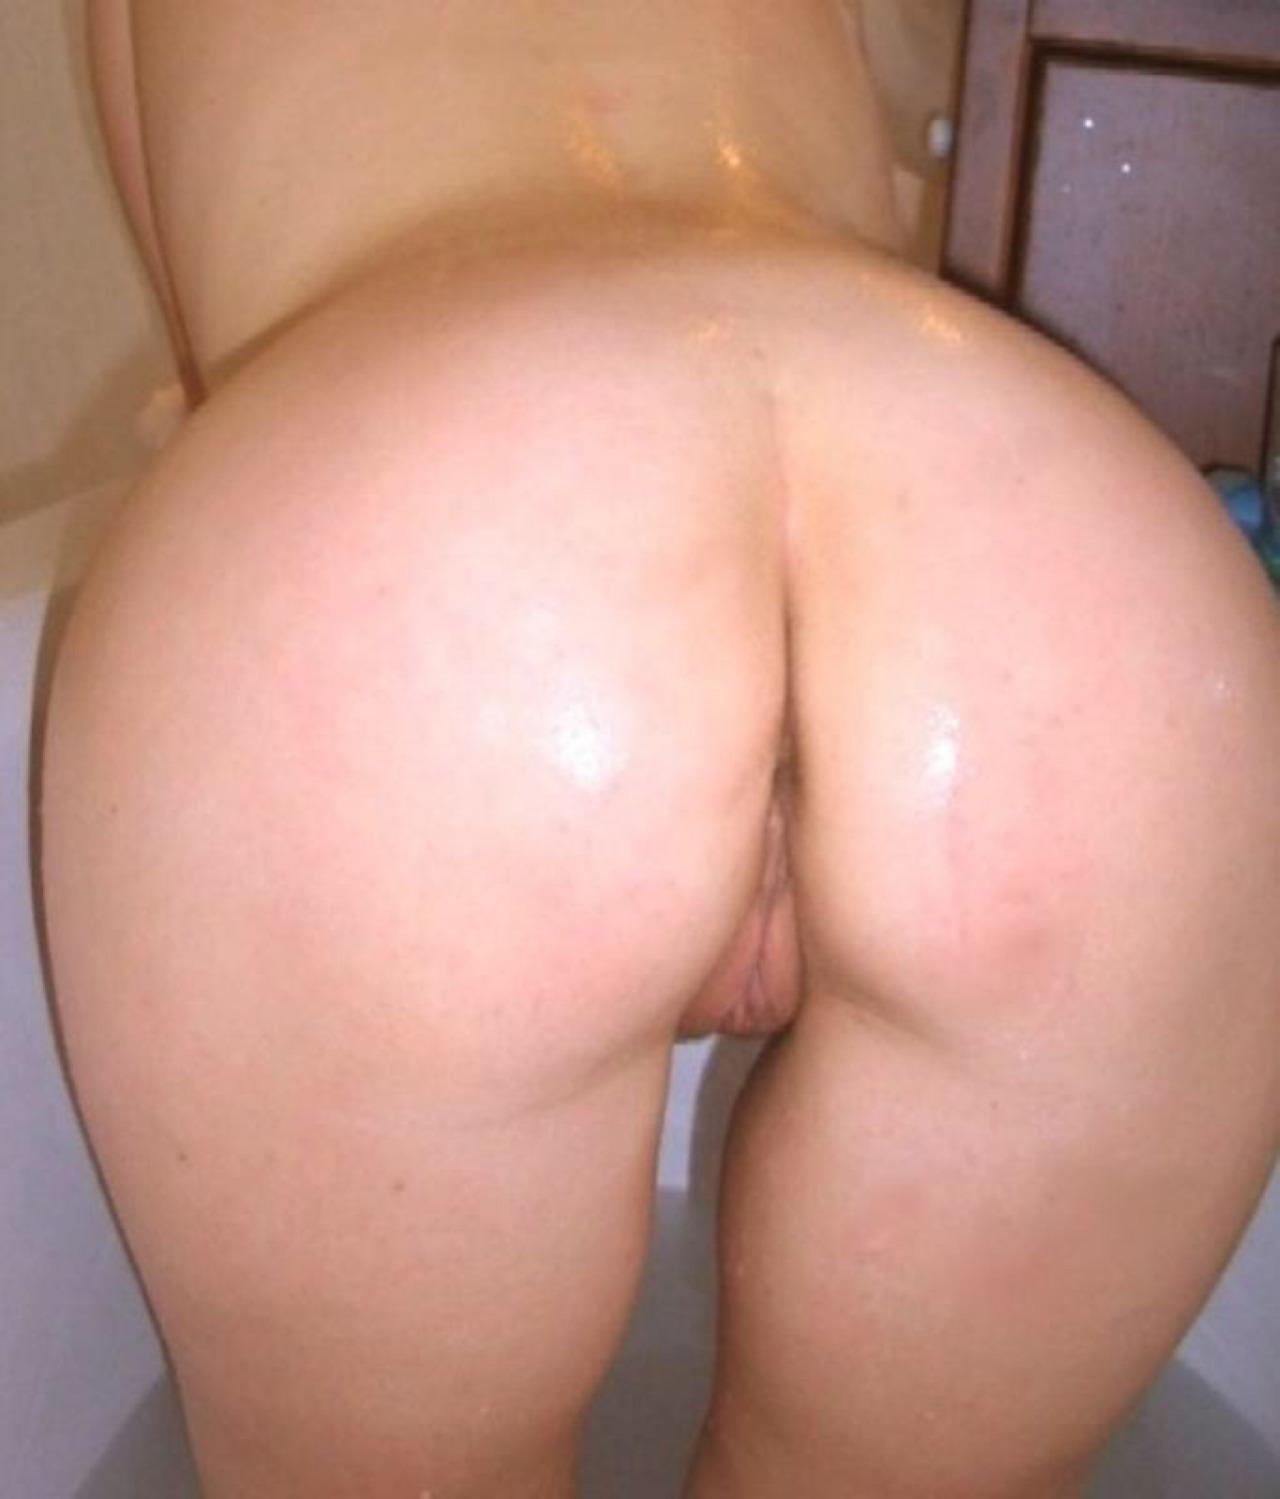 photo fille nue du 01 offerte